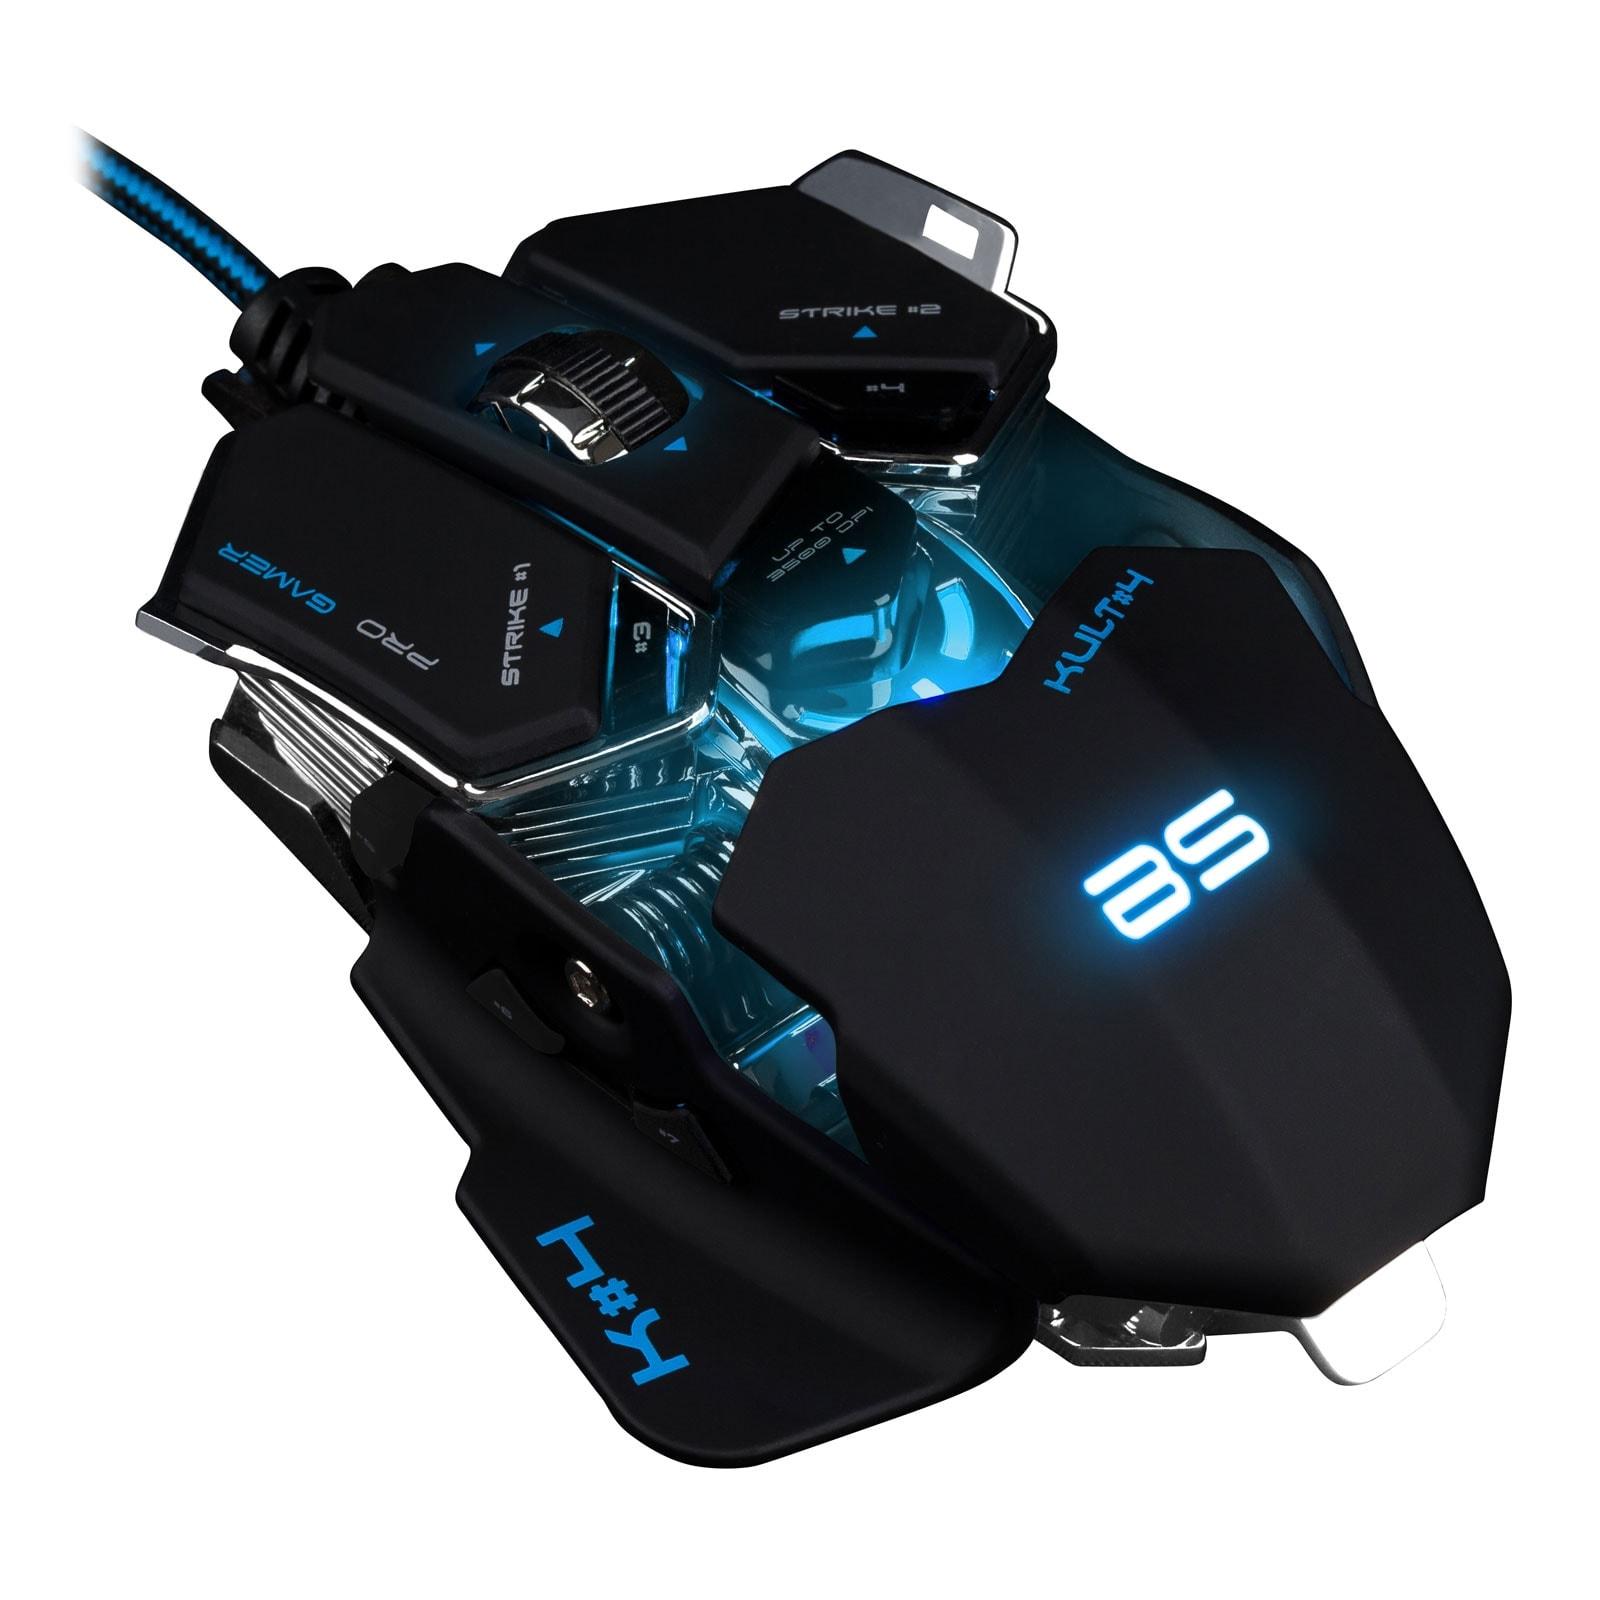 Bluestork KULT 4 BLACK ED. (BS-GM-KULT4) - Achat / Vente Souris PC sur Cybertek.fr - 1